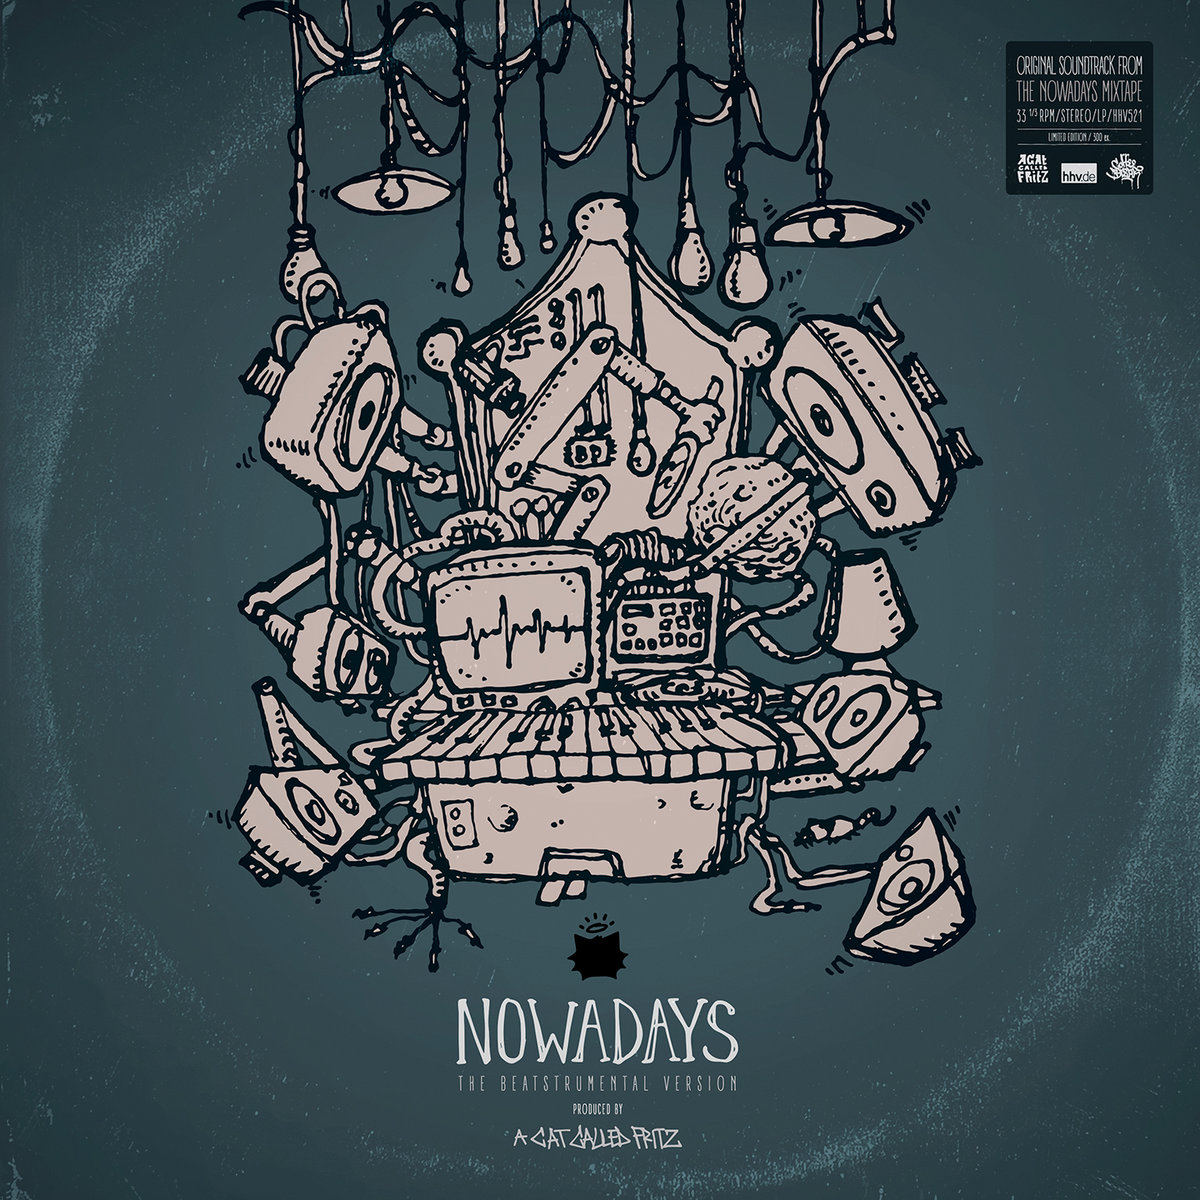 aCatCalledFritz - NOWADAYS The Beatstrumental Version (2016)